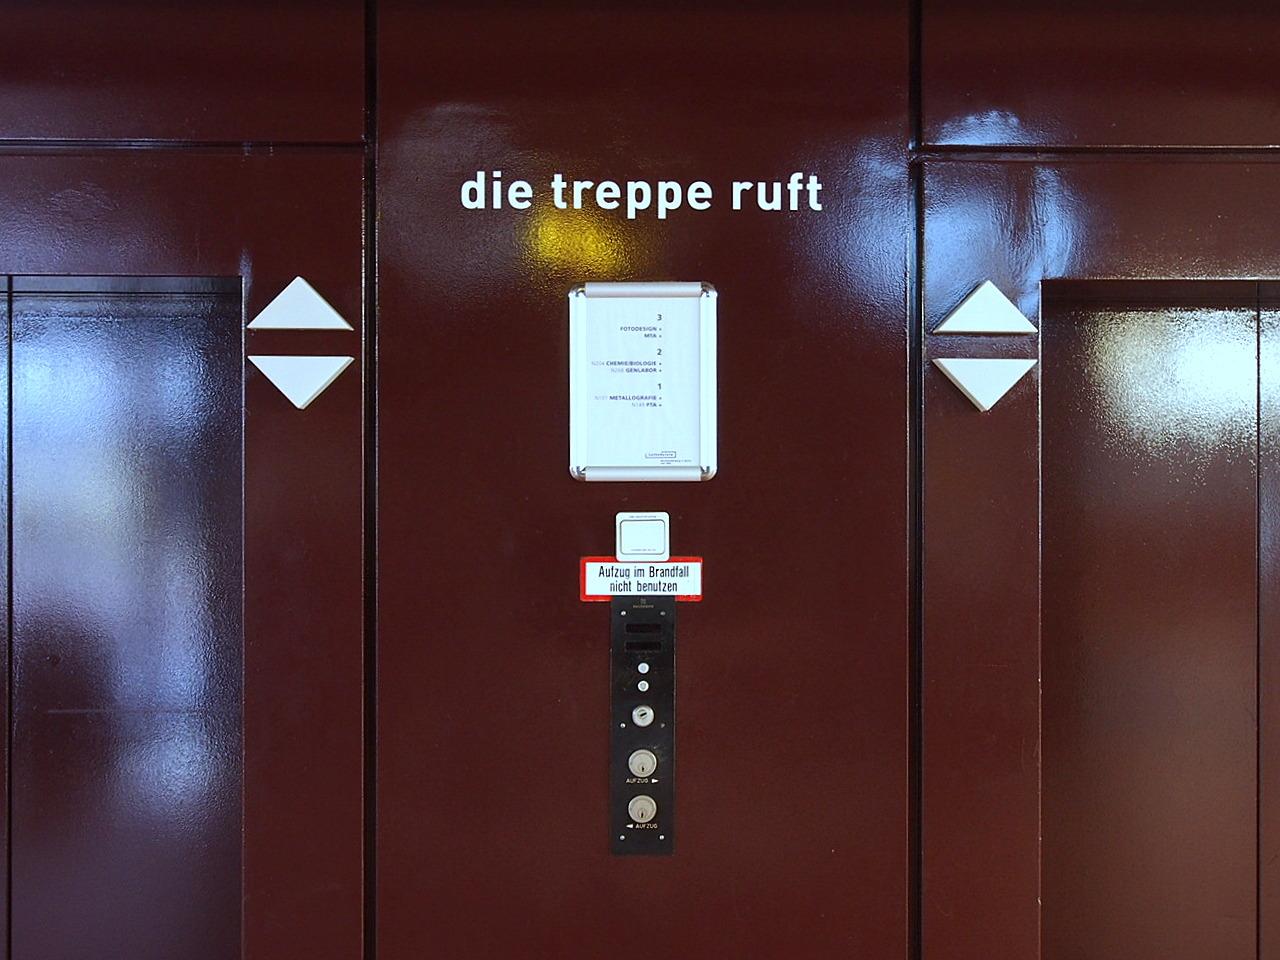 Lette Verein Berlin - Gute Gesunde Schule